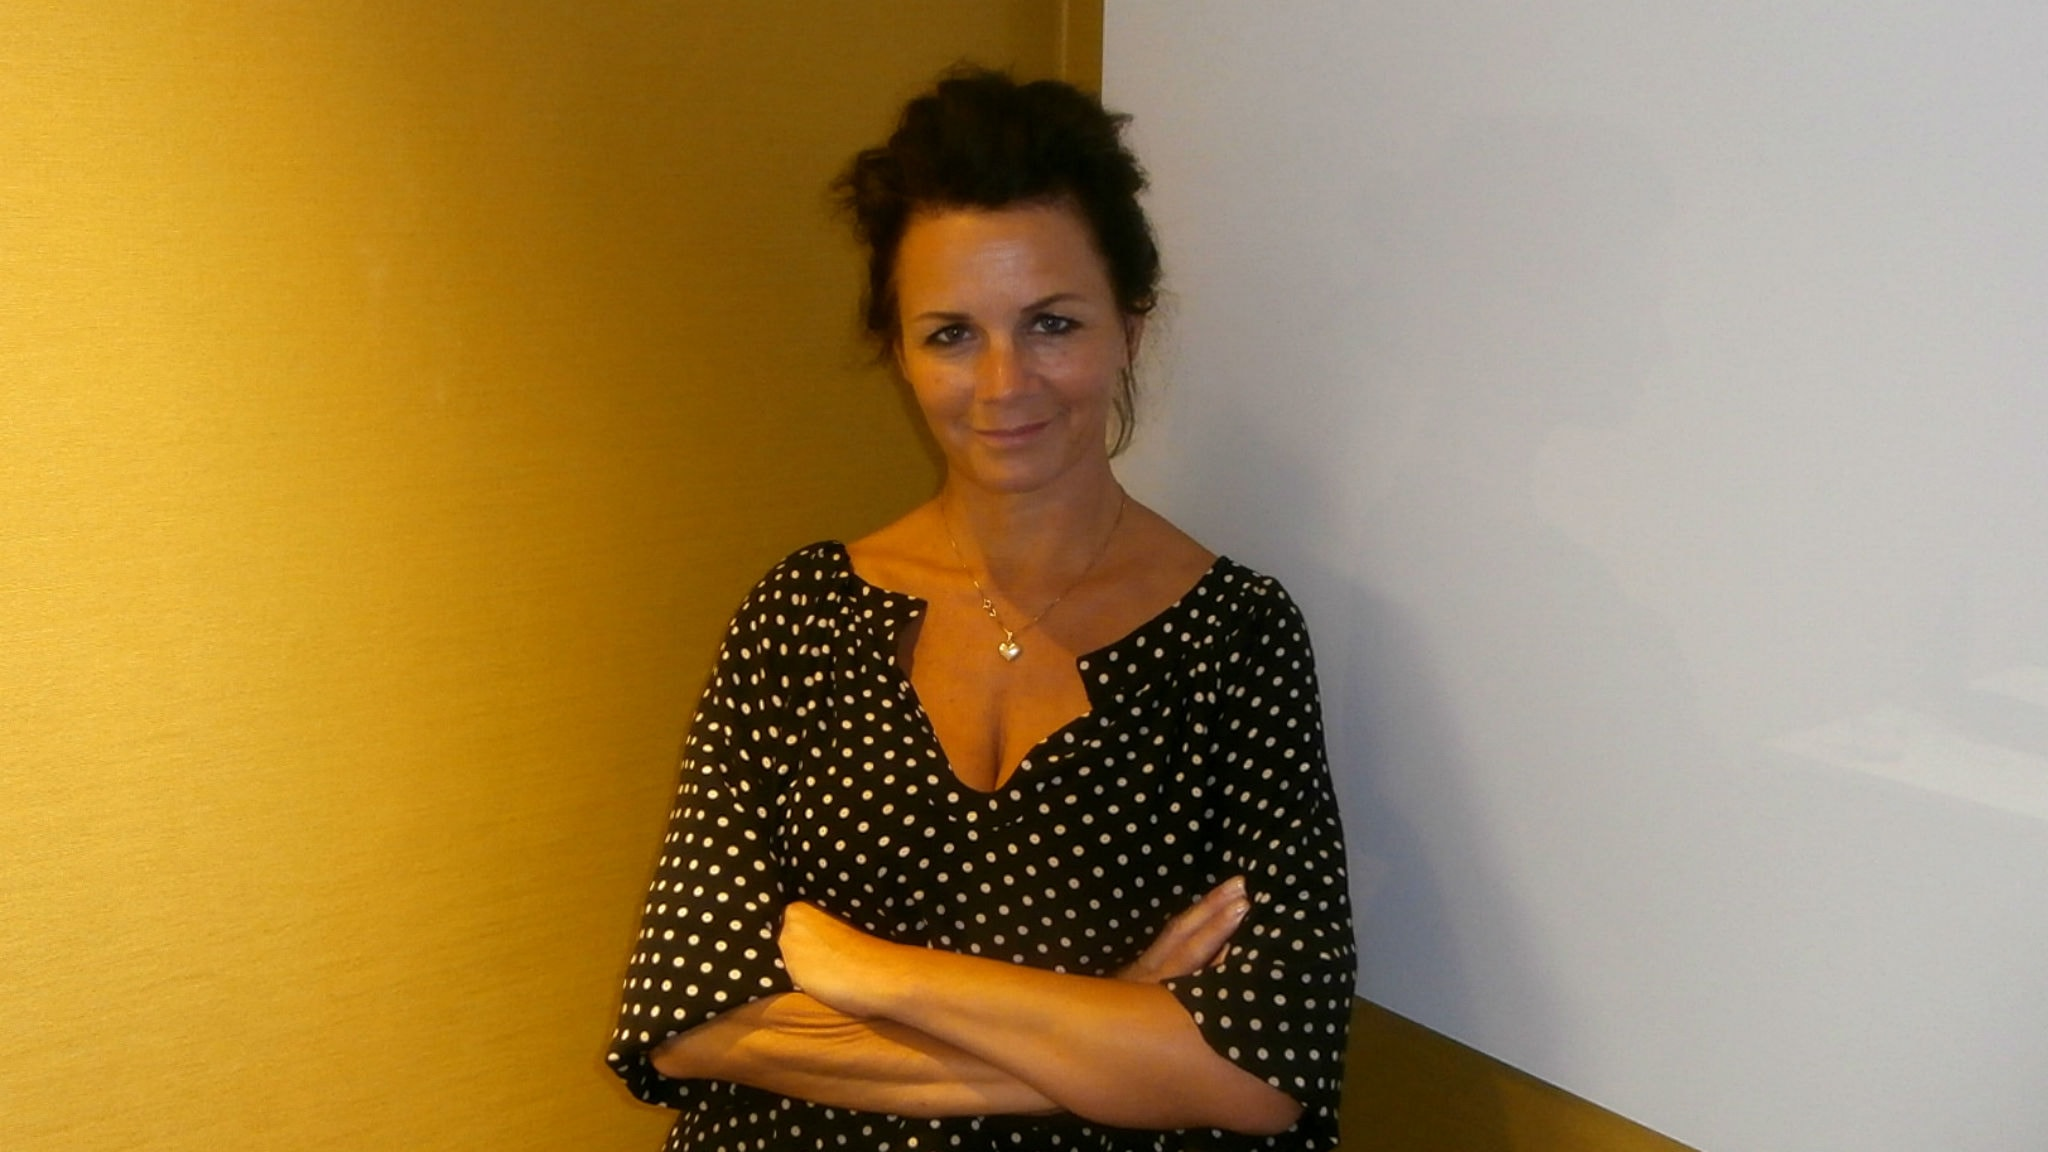 Lena Philipsson (Foto: Micke Cederberg/Sveriges Radio)